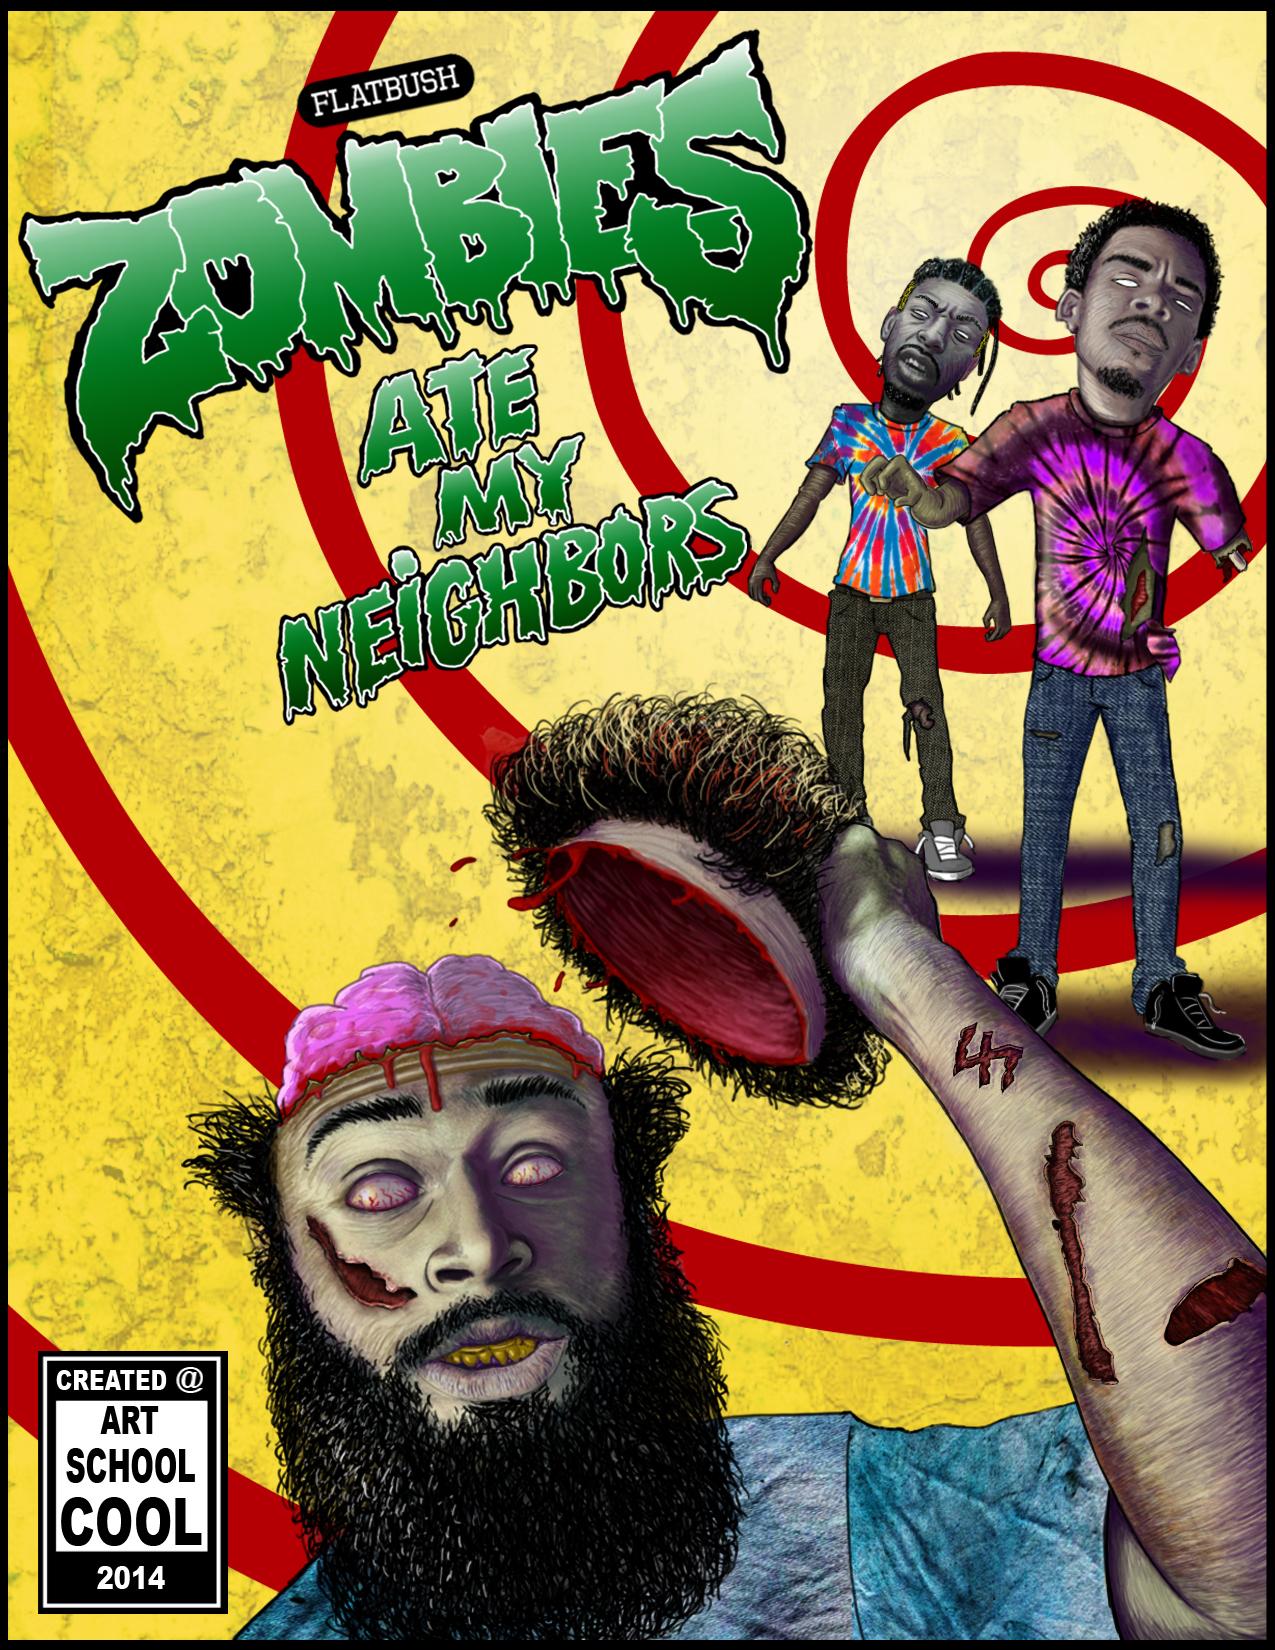 ArtSchoolCool_FlatBush_Zombies